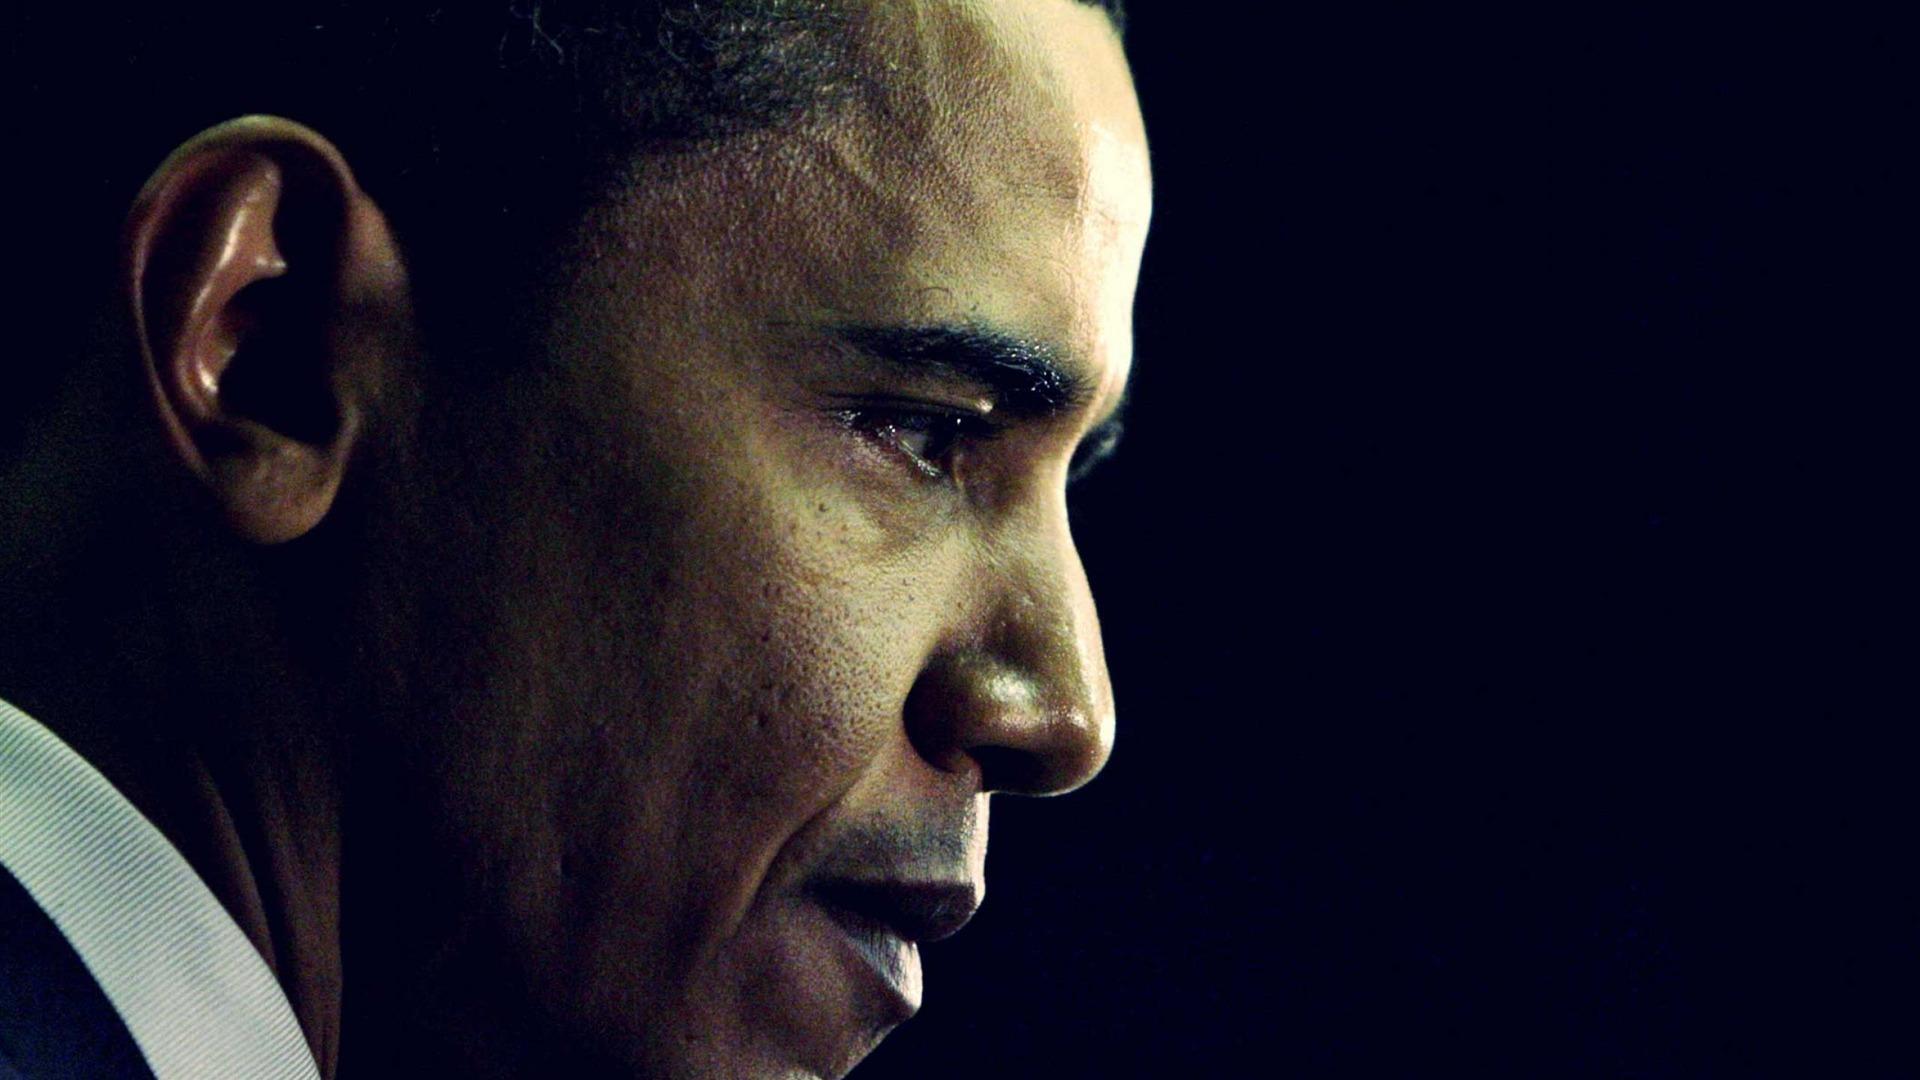 Obama Male Celebrity Photo Wallpaper   1920x1080 wallpaper 1920x1080